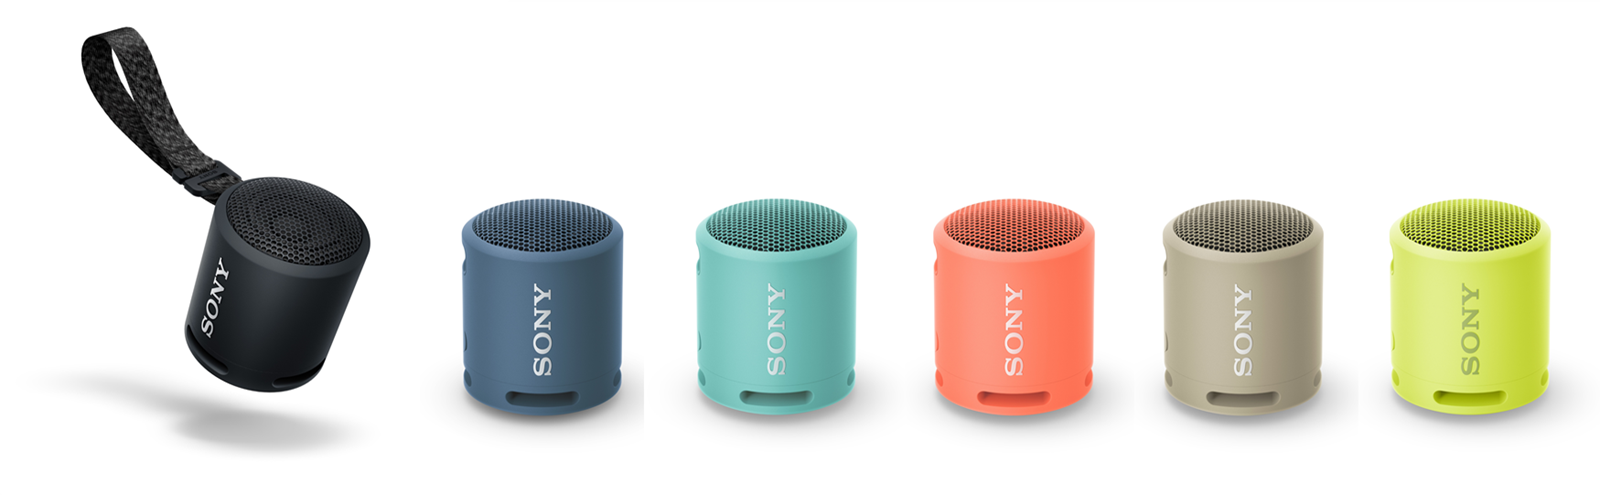 Sony EXTRA BASS 重低音無線藍牙喇叭 SRS-XB13 @3C 達人廖阿輝